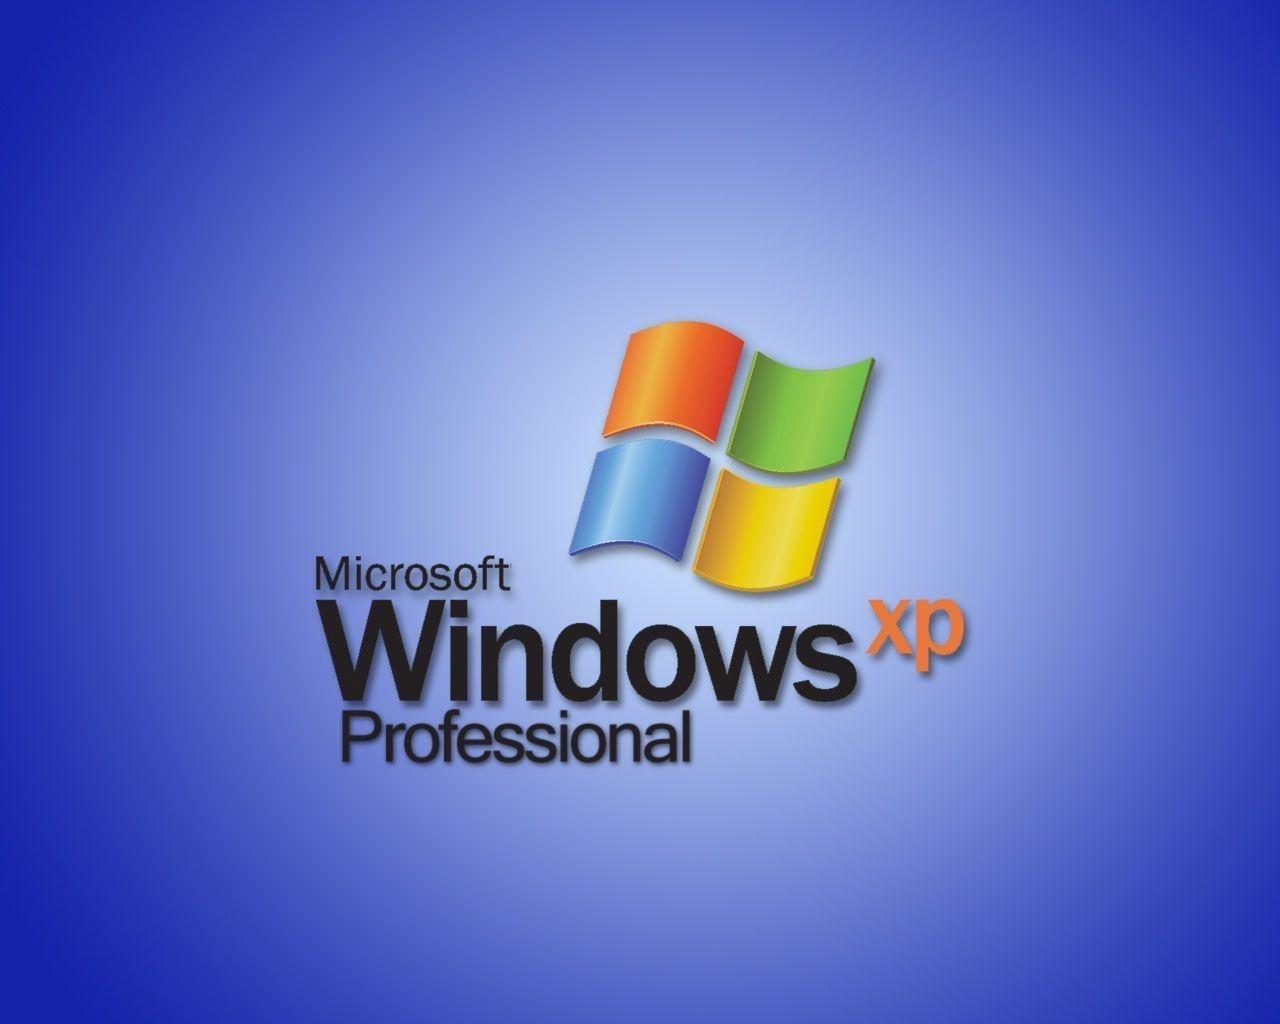 windows xp pro wallpapers - wallpaper cave